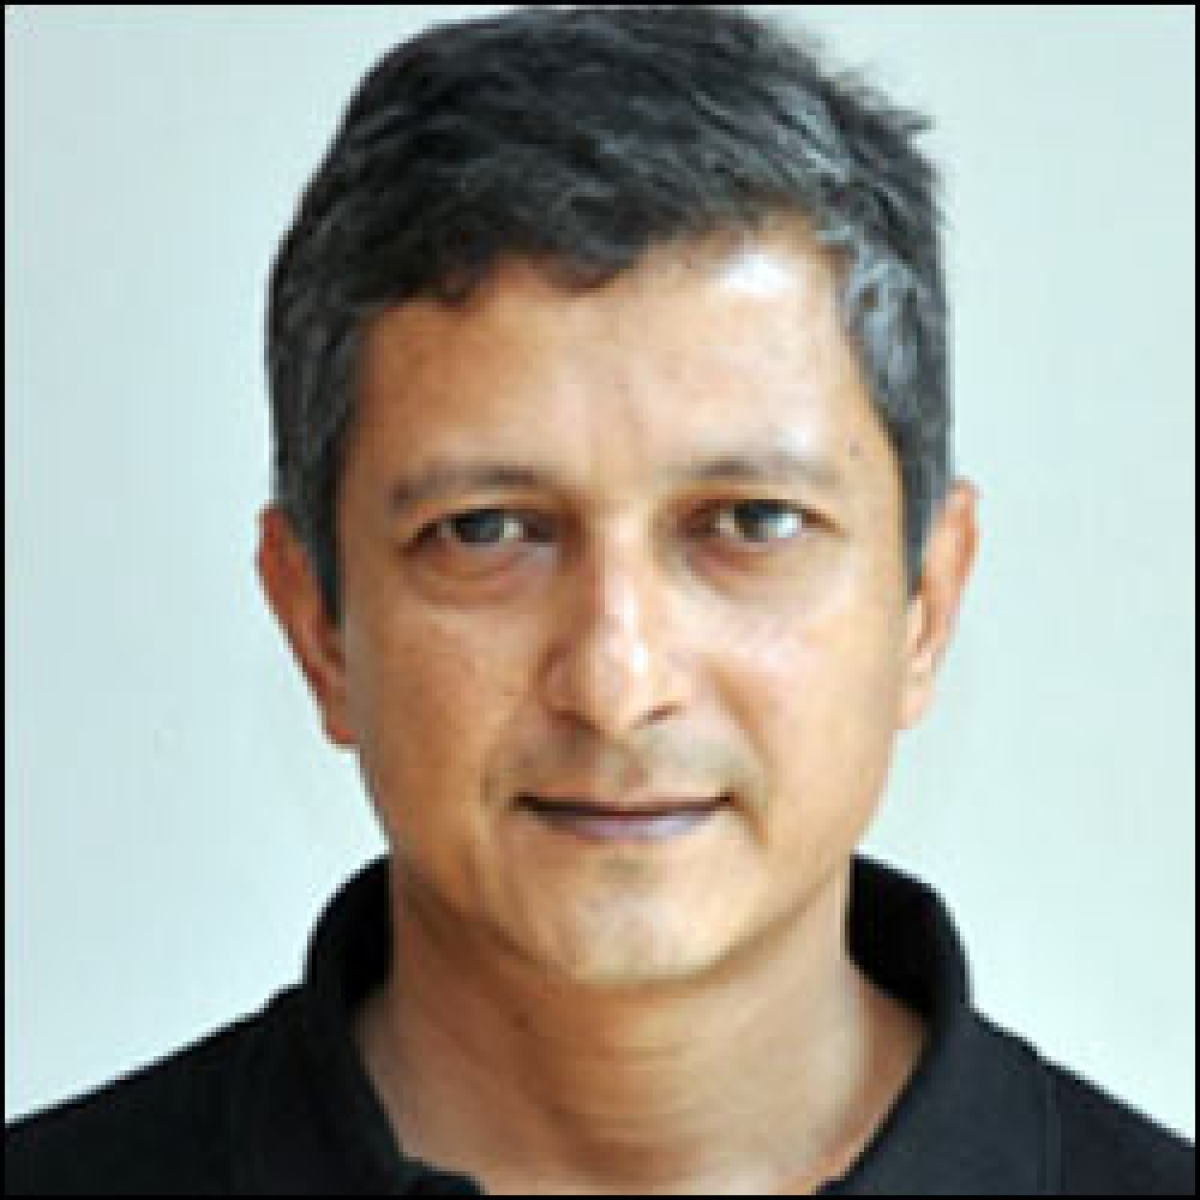 Law & Kenneth Saatchi & Saatchi creates Kashmir montage